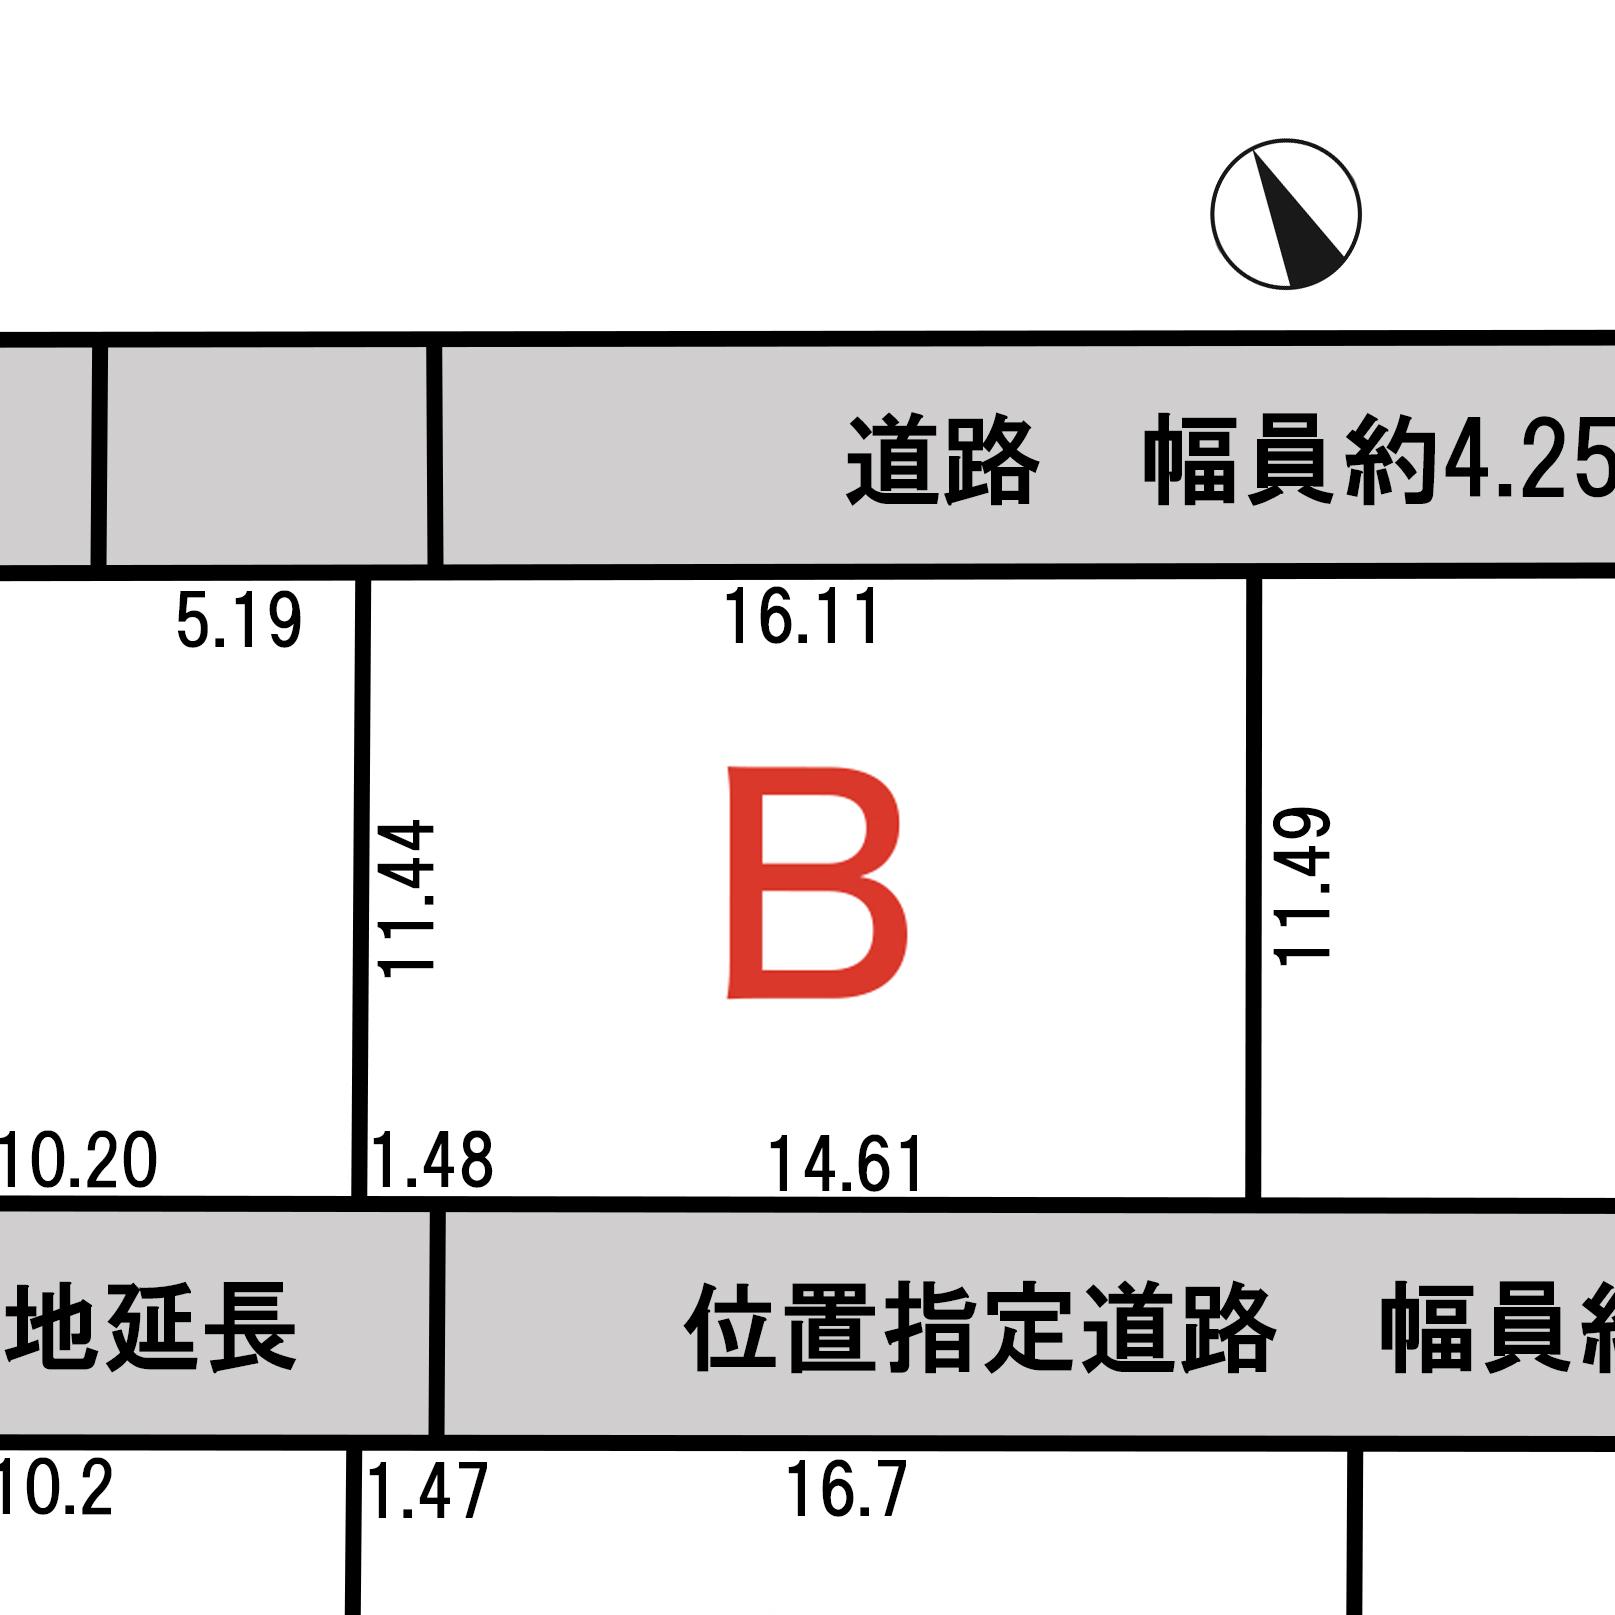 諏訪市上川二丁目 B区画_サブ画像02